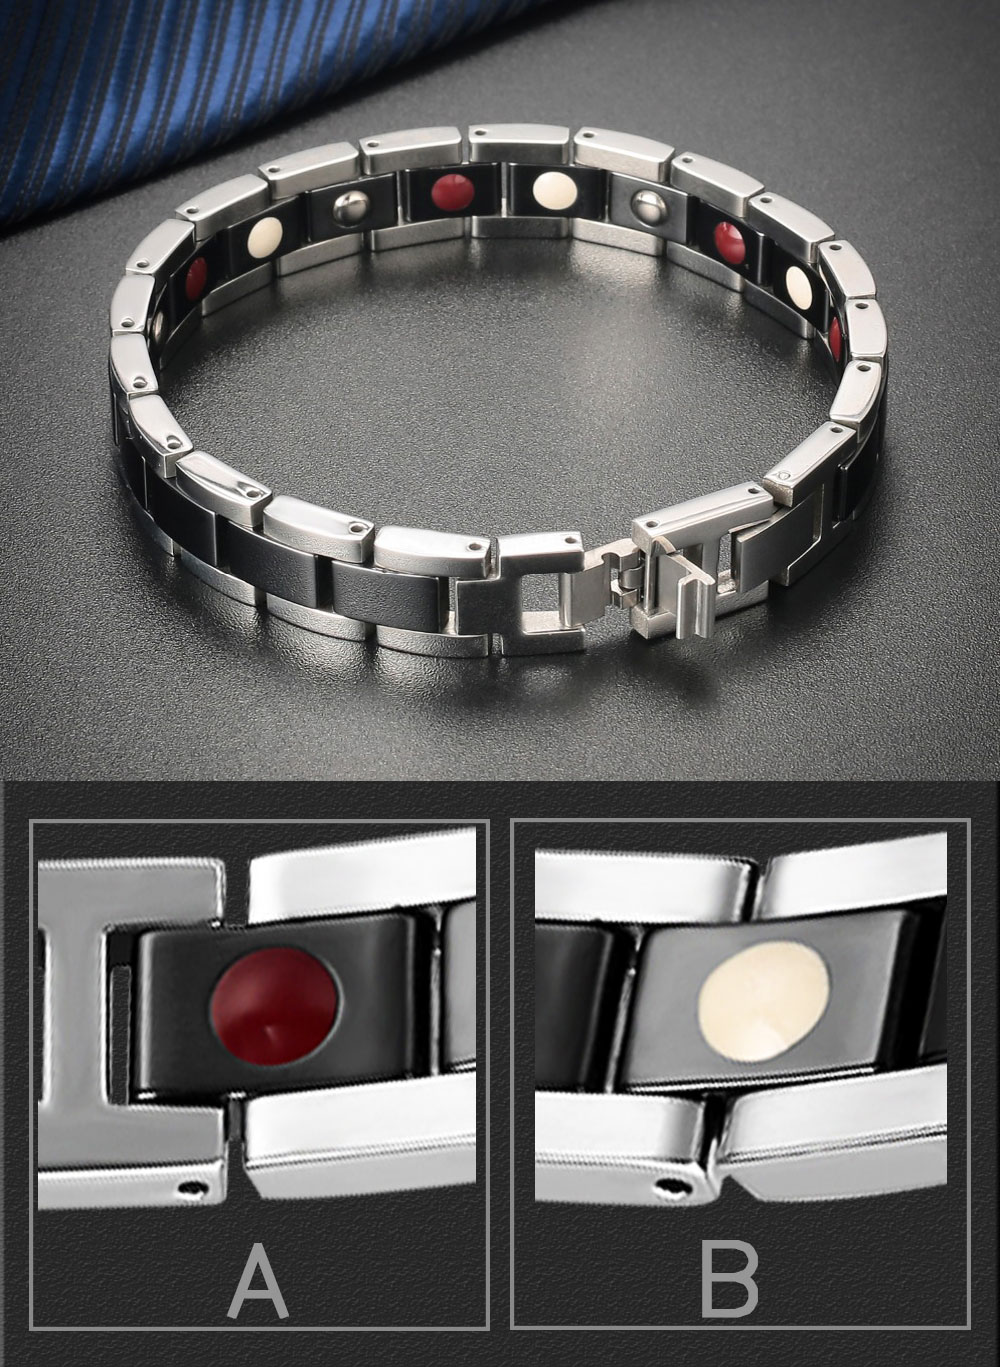 Moocare women men Germanium magnetic bracelet health stainless steel ceramic male female couples hand wrist chain adjustable